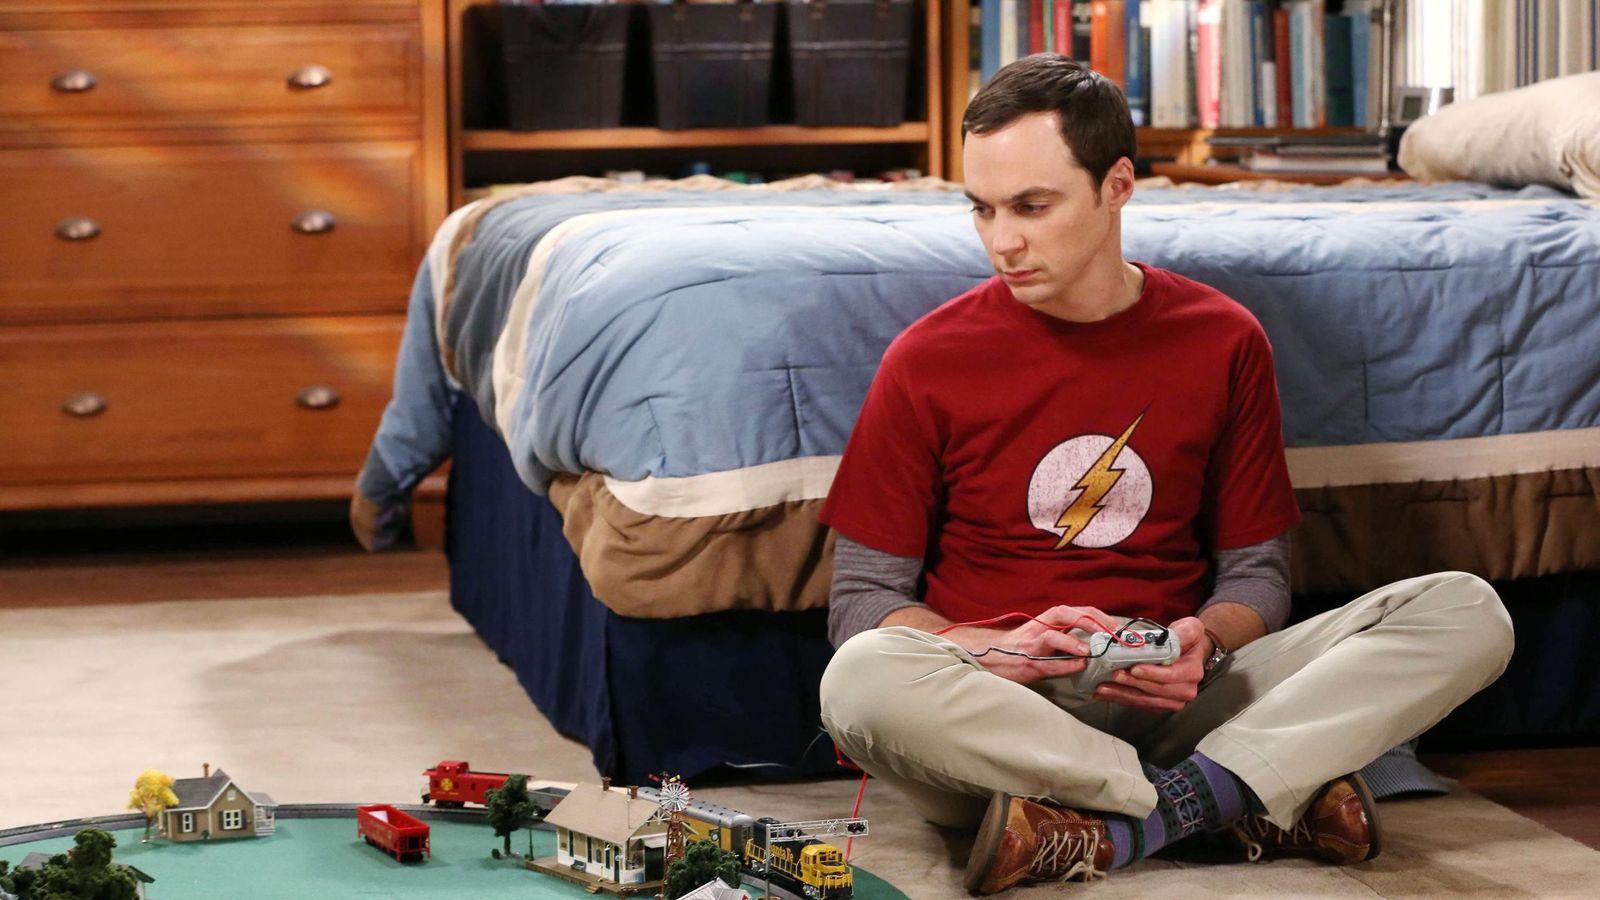 big bang theory prequel to focus on sheldon s childhood